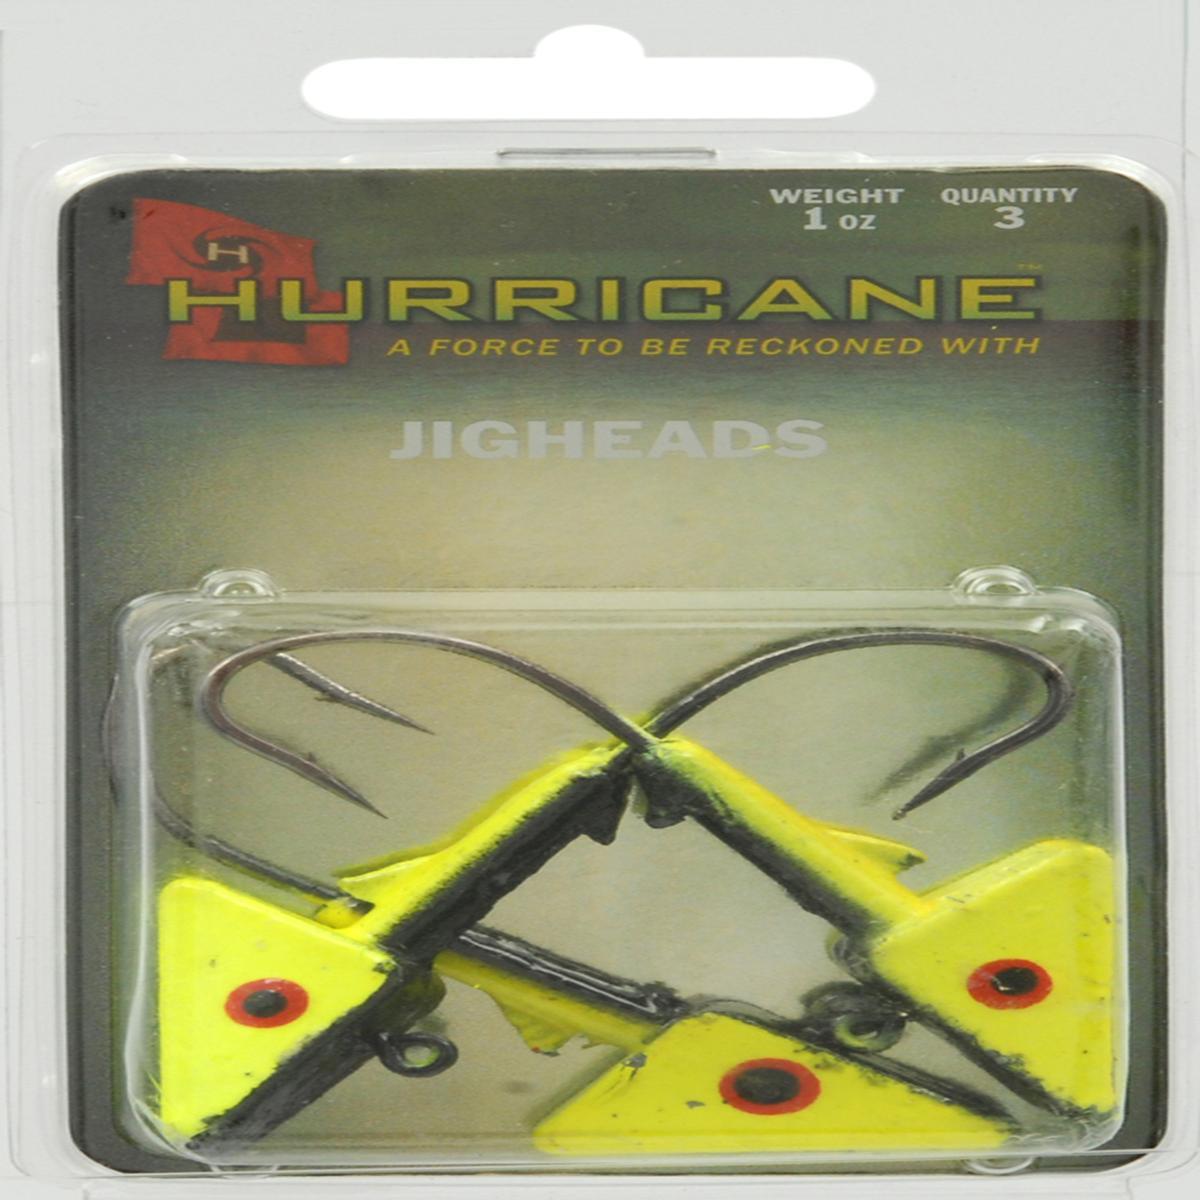 Hurricane Shad Heads 1Oz 3 Pack Chartreuse/Black - H-SAH10-103